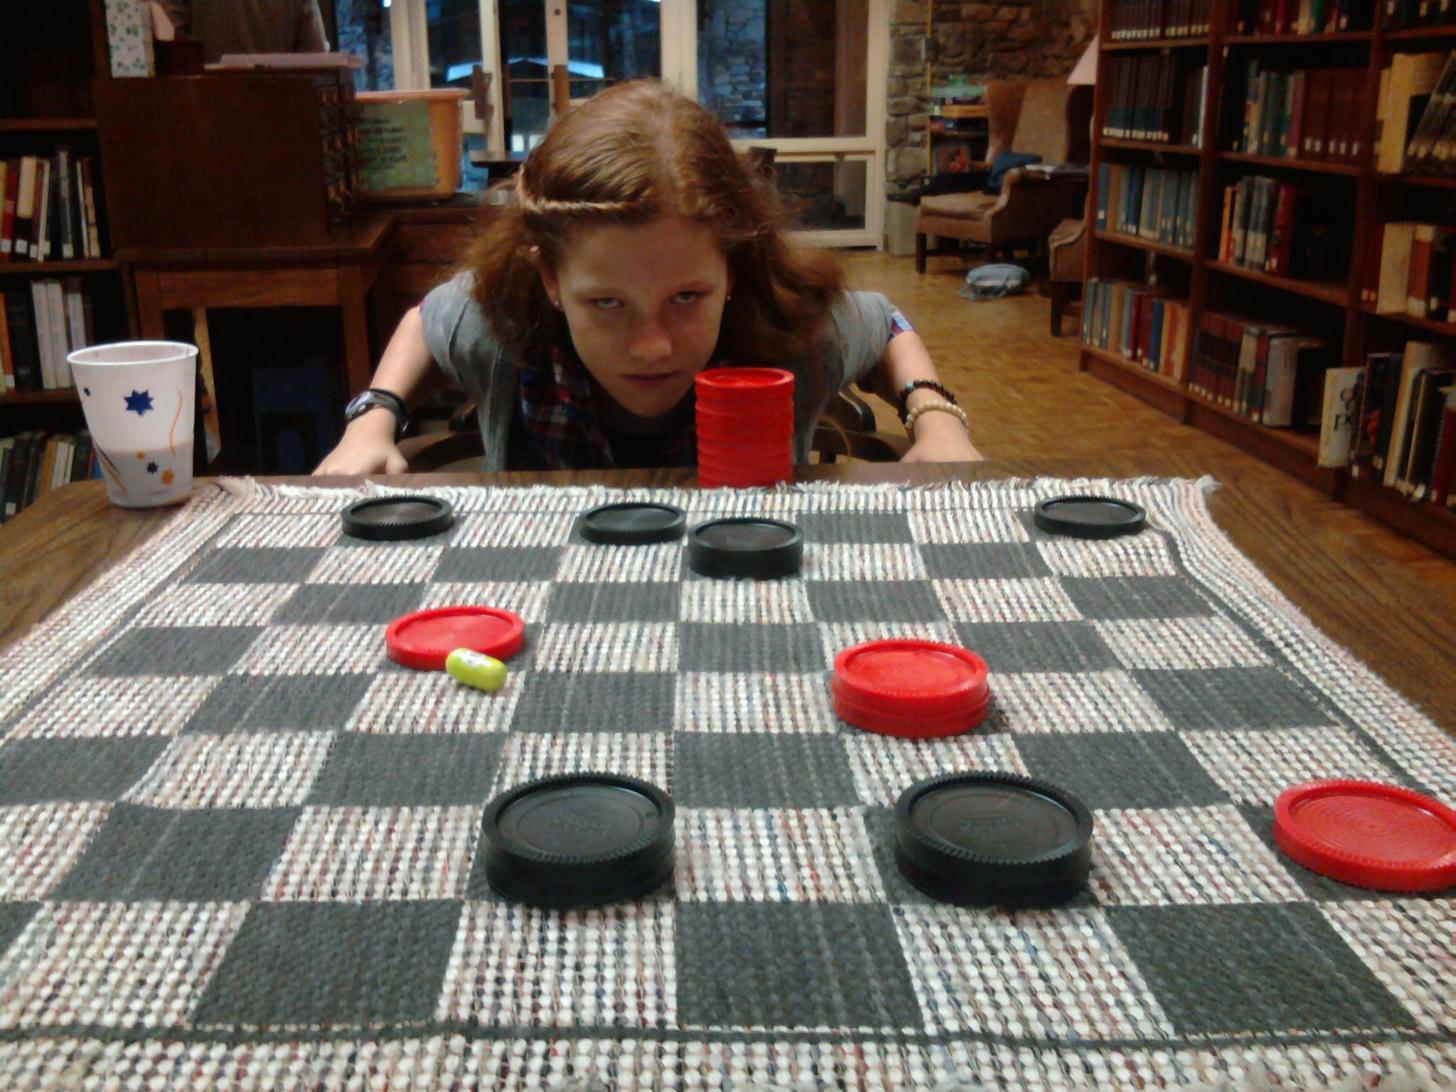 Winning at checkers